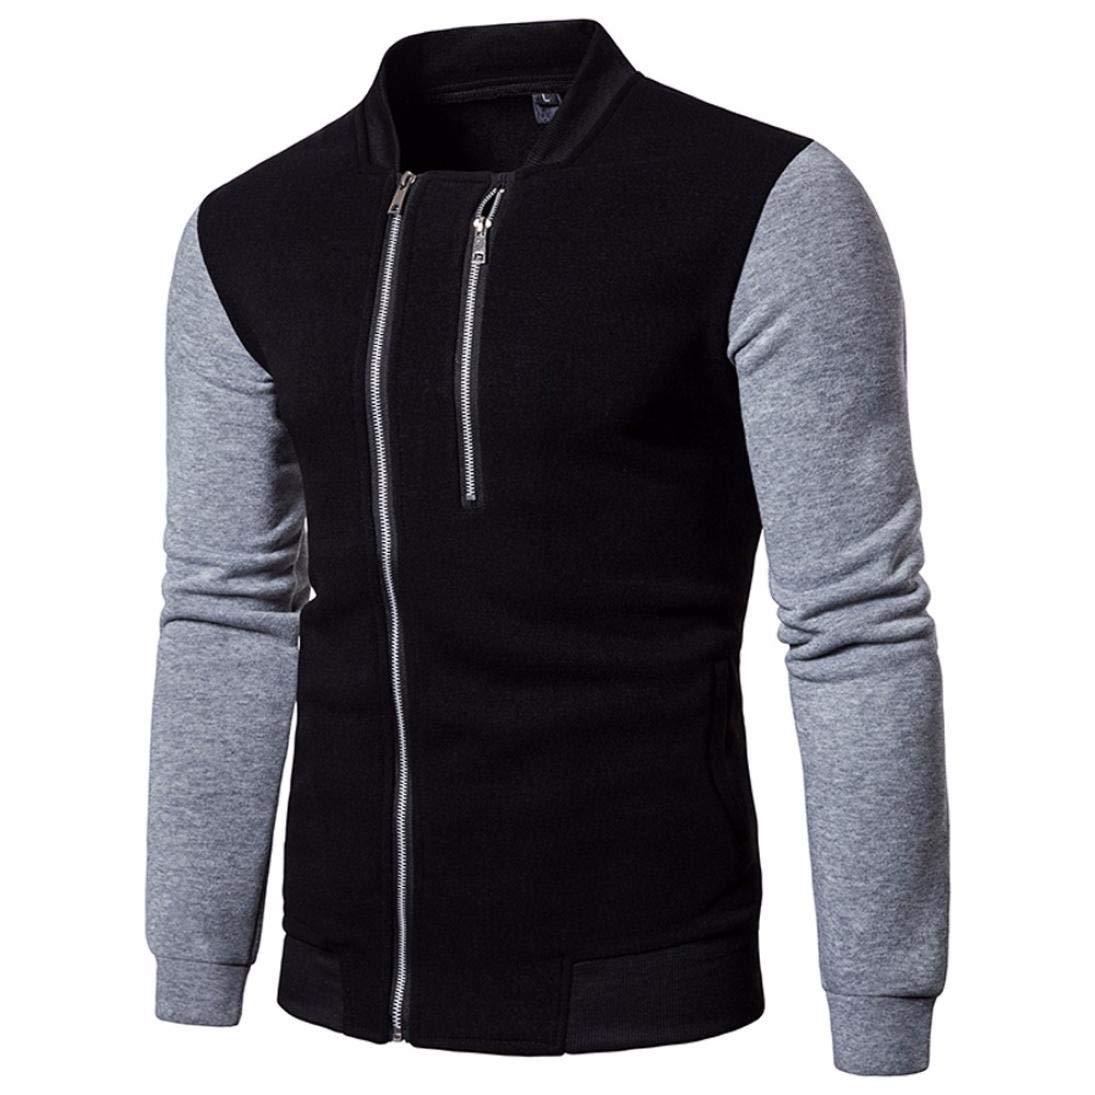 Men's Fashion Long Sleeve Patchwork Zipper Sweatshirt Tops Bomber Jacket Coat Outwear